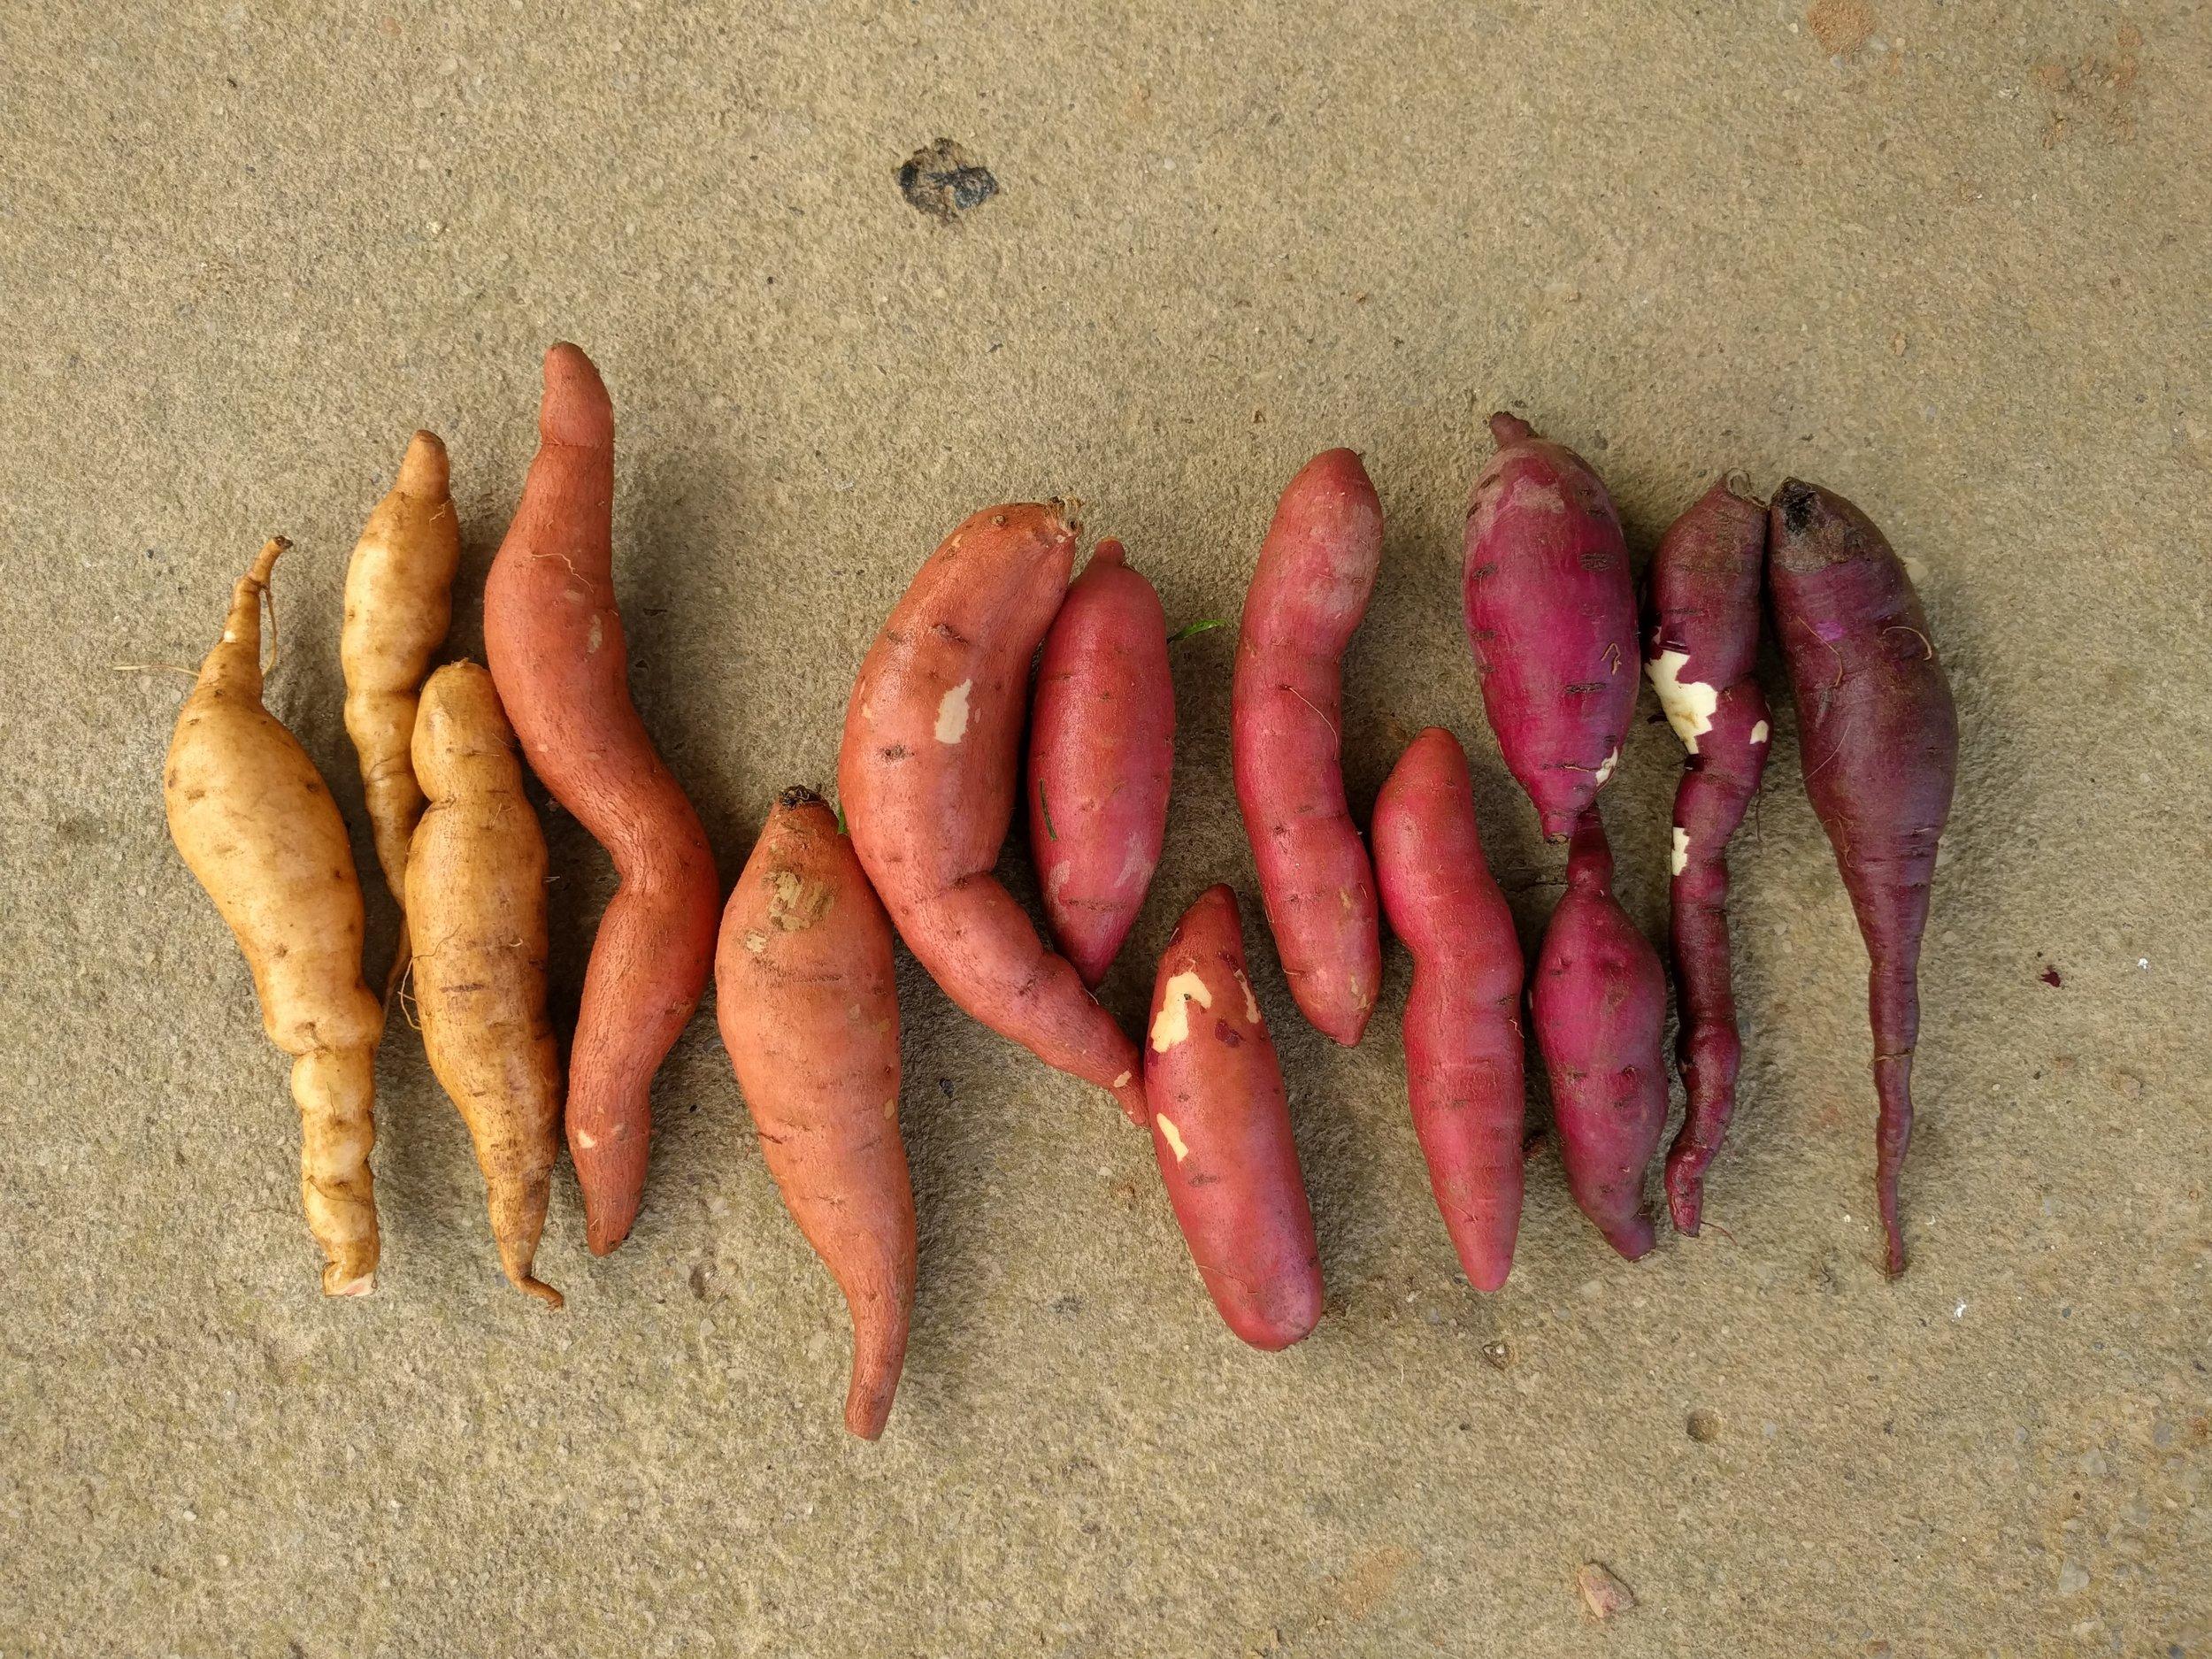 Fingerling sweet potatoes. Longest tuber pictured is about 5 inches.   Left to right: White Hamon, All-gold, Hernandez, Covington, Beauregard, Murasaki, Adirondack blue.